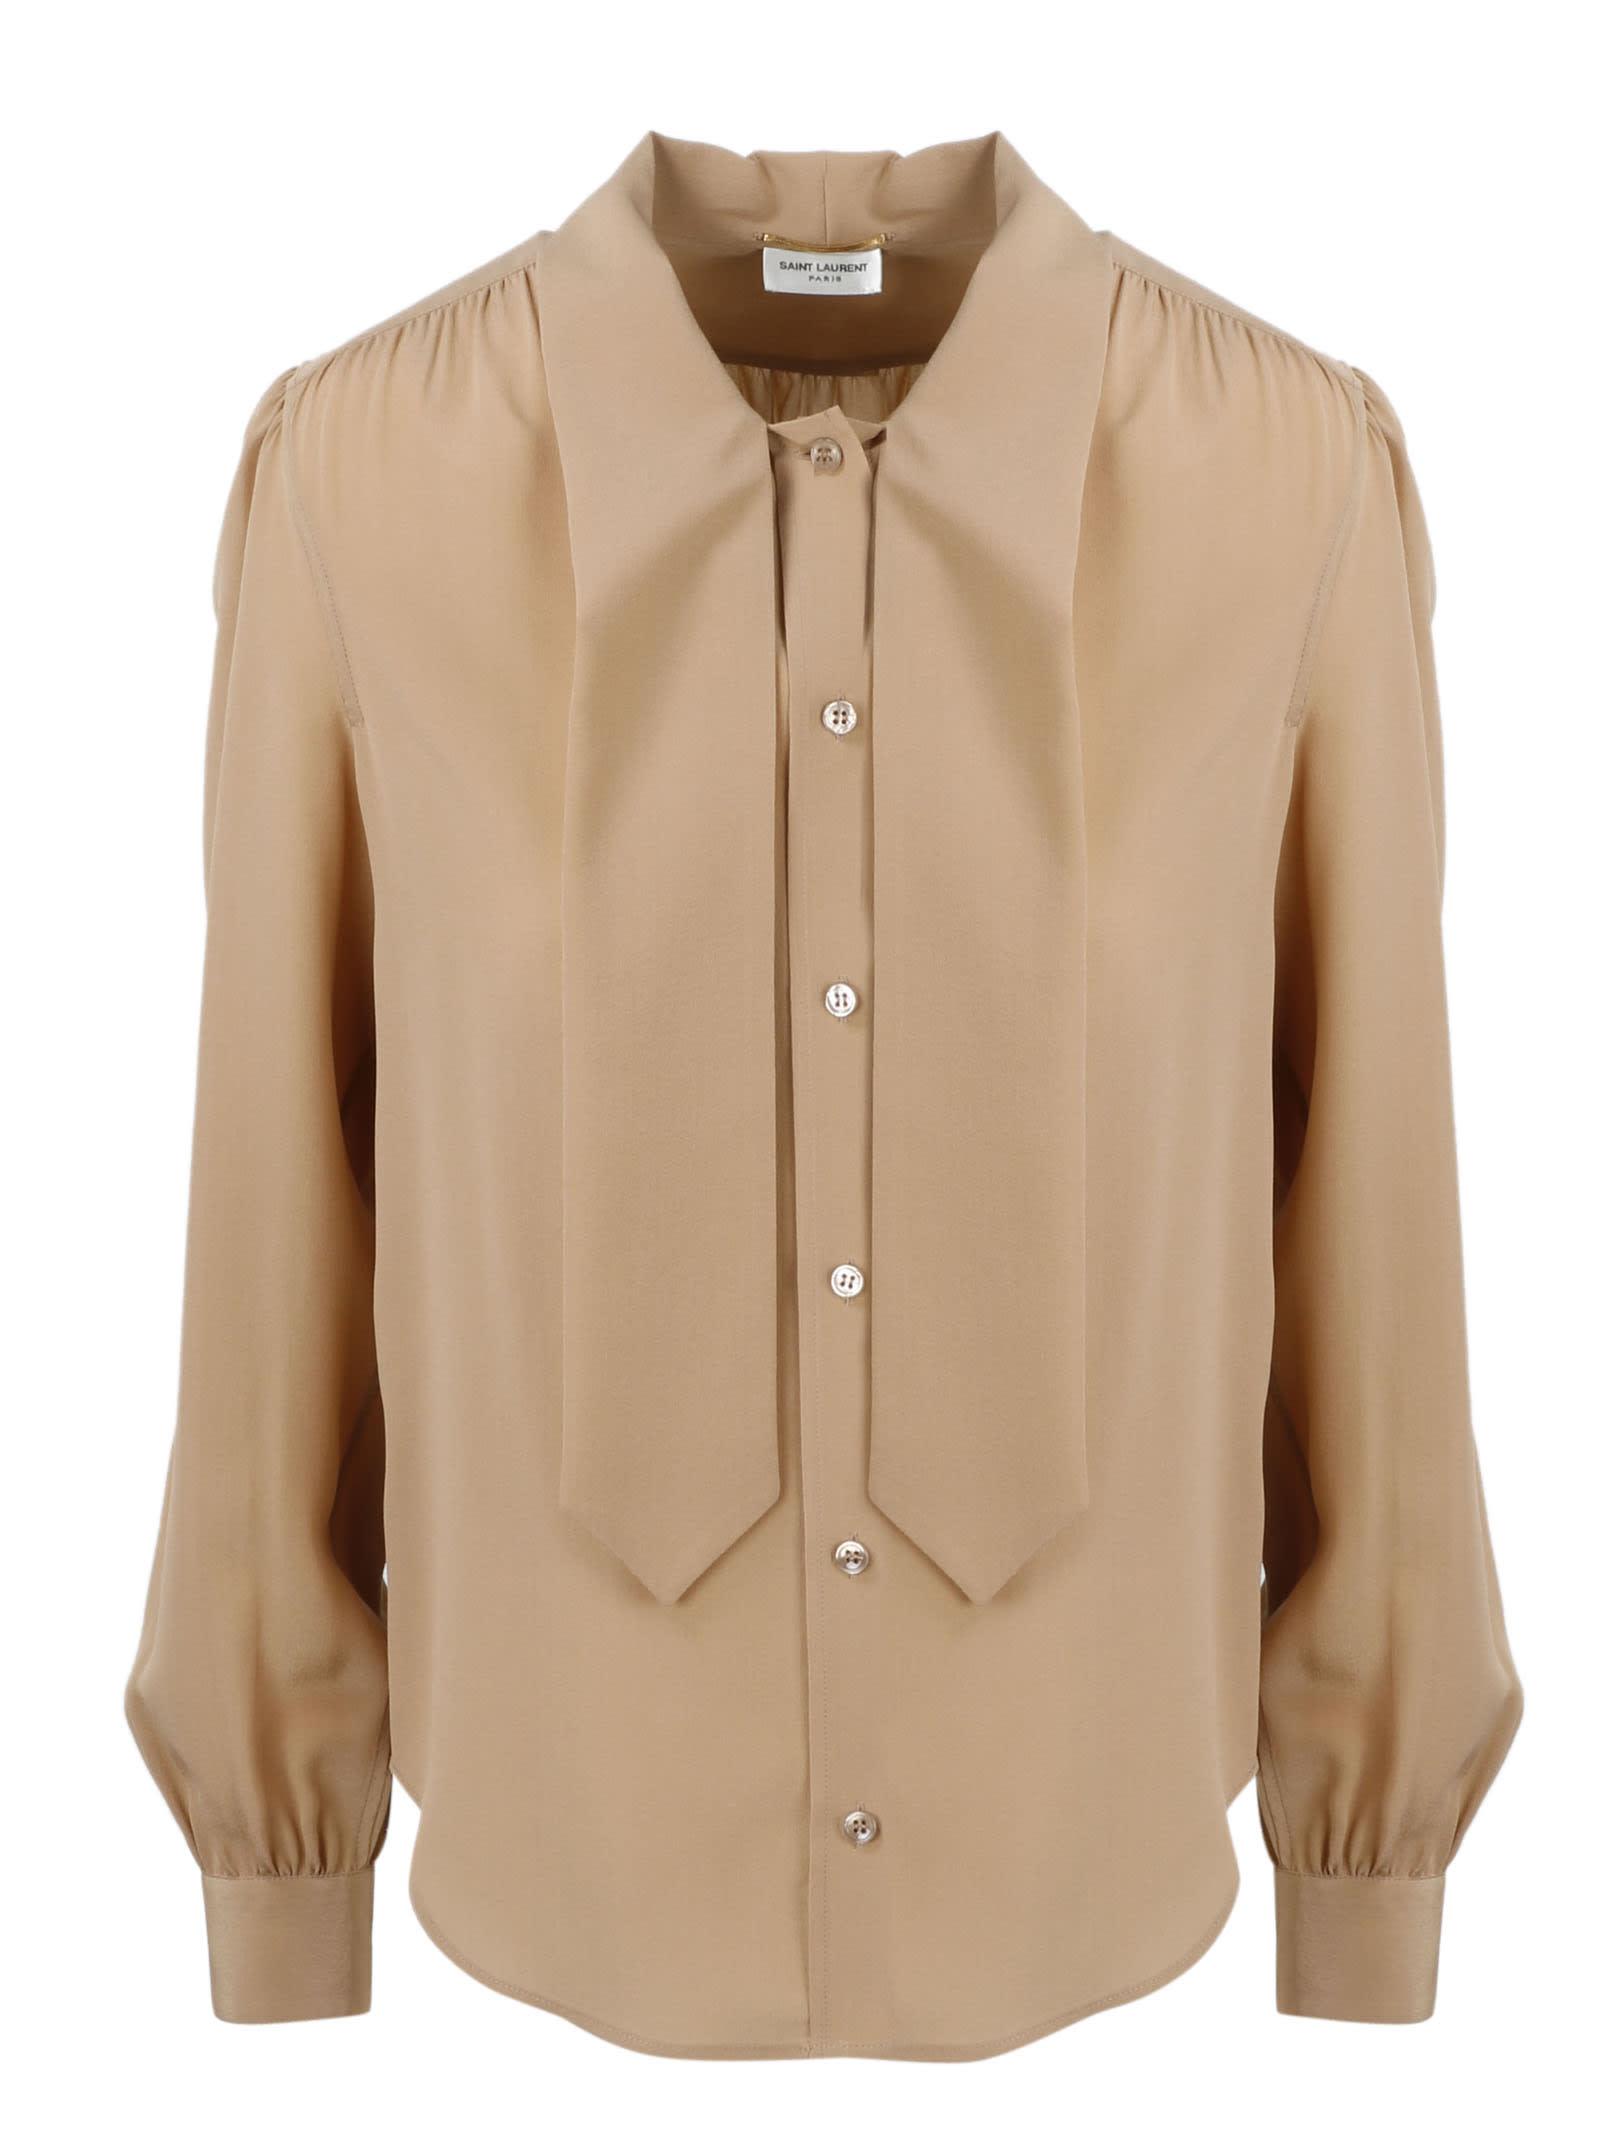 Saint Laurent Crepe De Chine Shirt In Brown